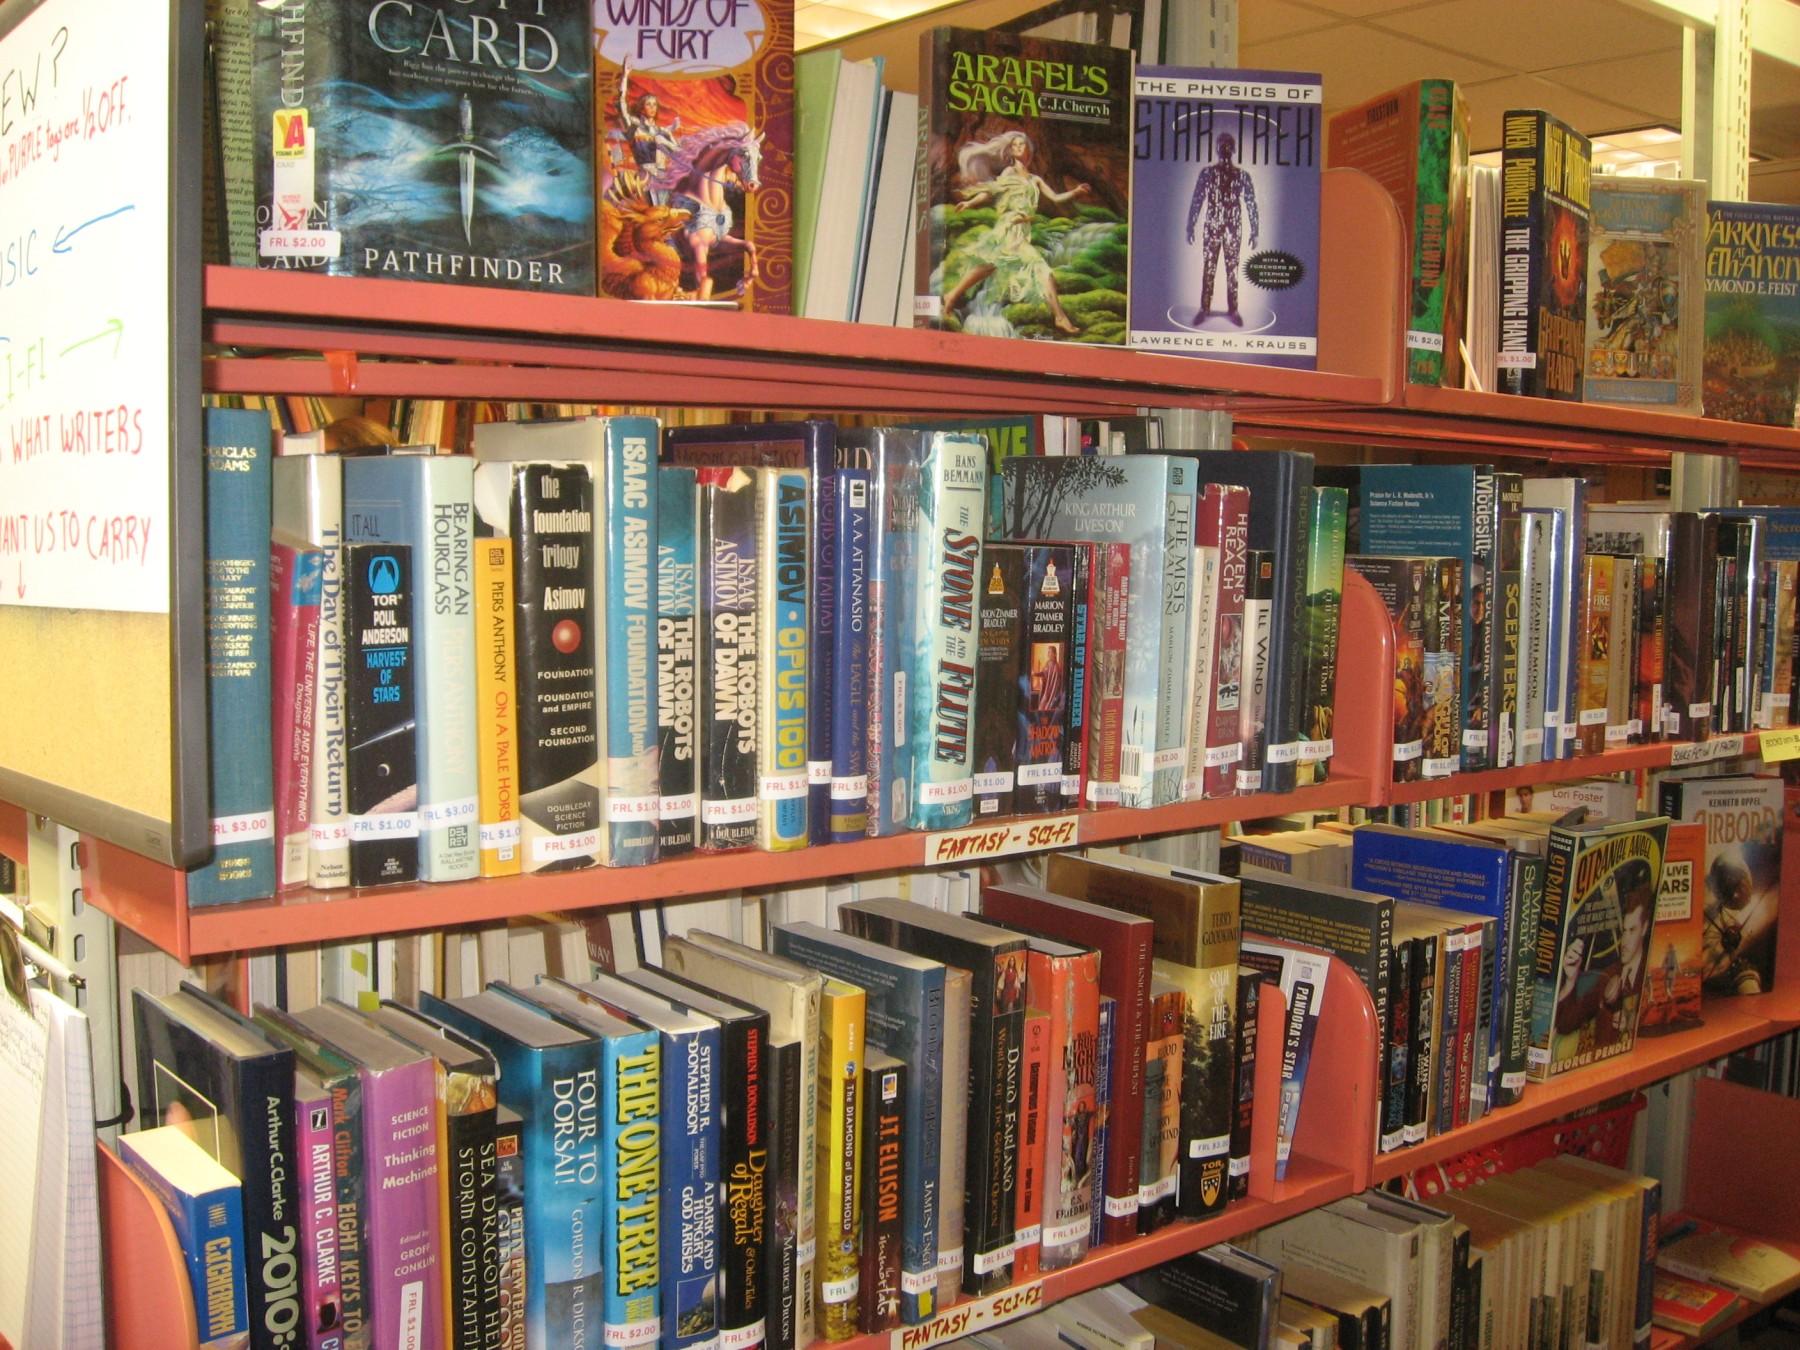 Serendipity shelves